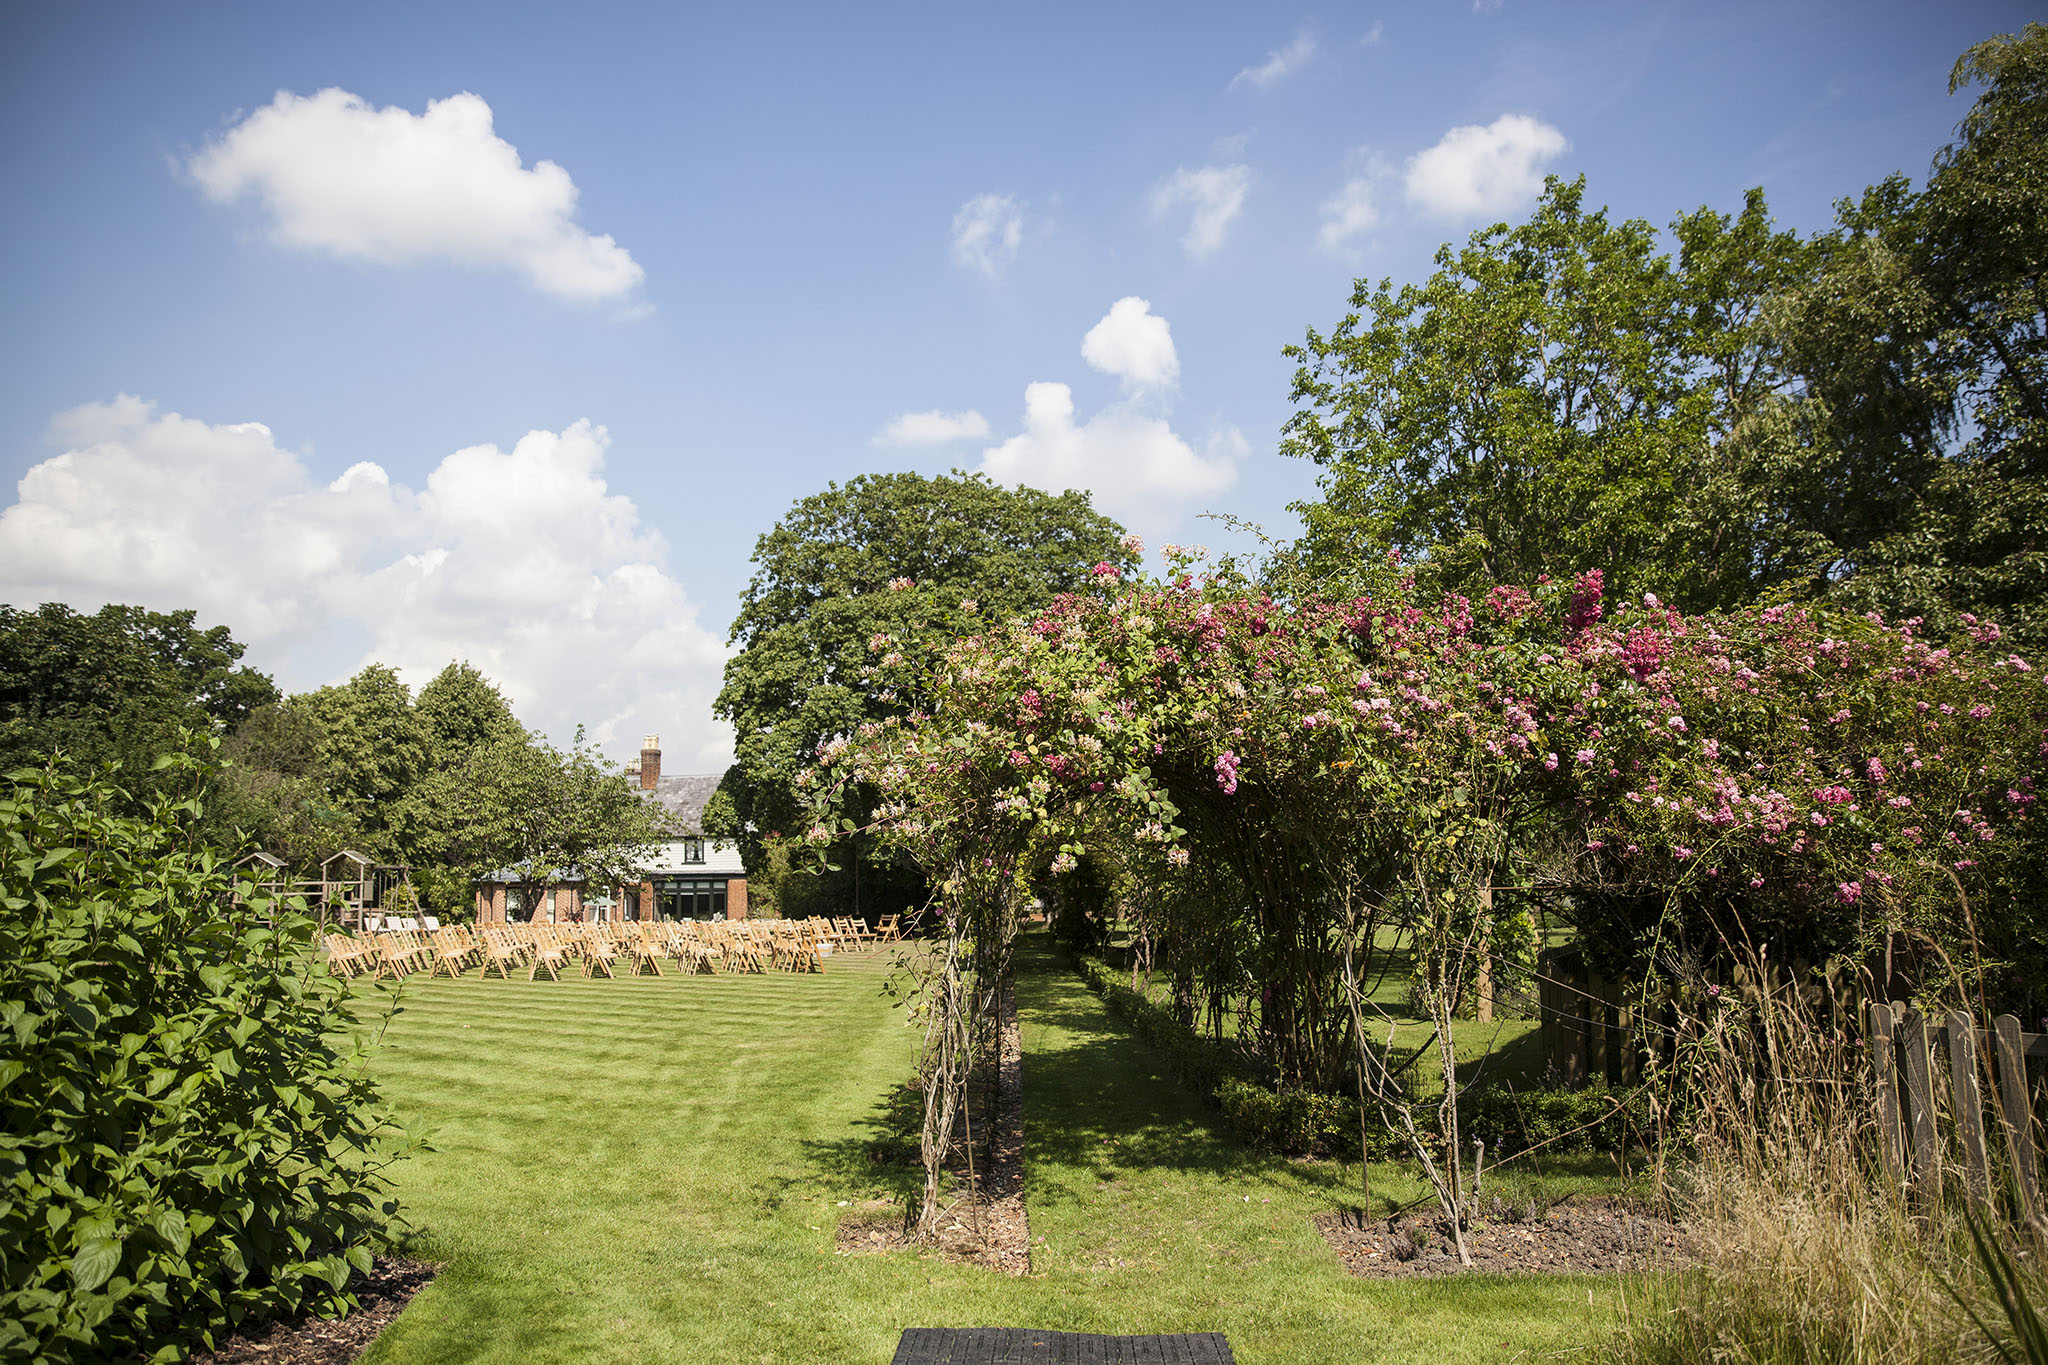 elizabethgphotography_kingslangley_hertfordshire_fineart_wedding_pottersbar_matt_katie_pegg_07.jpg